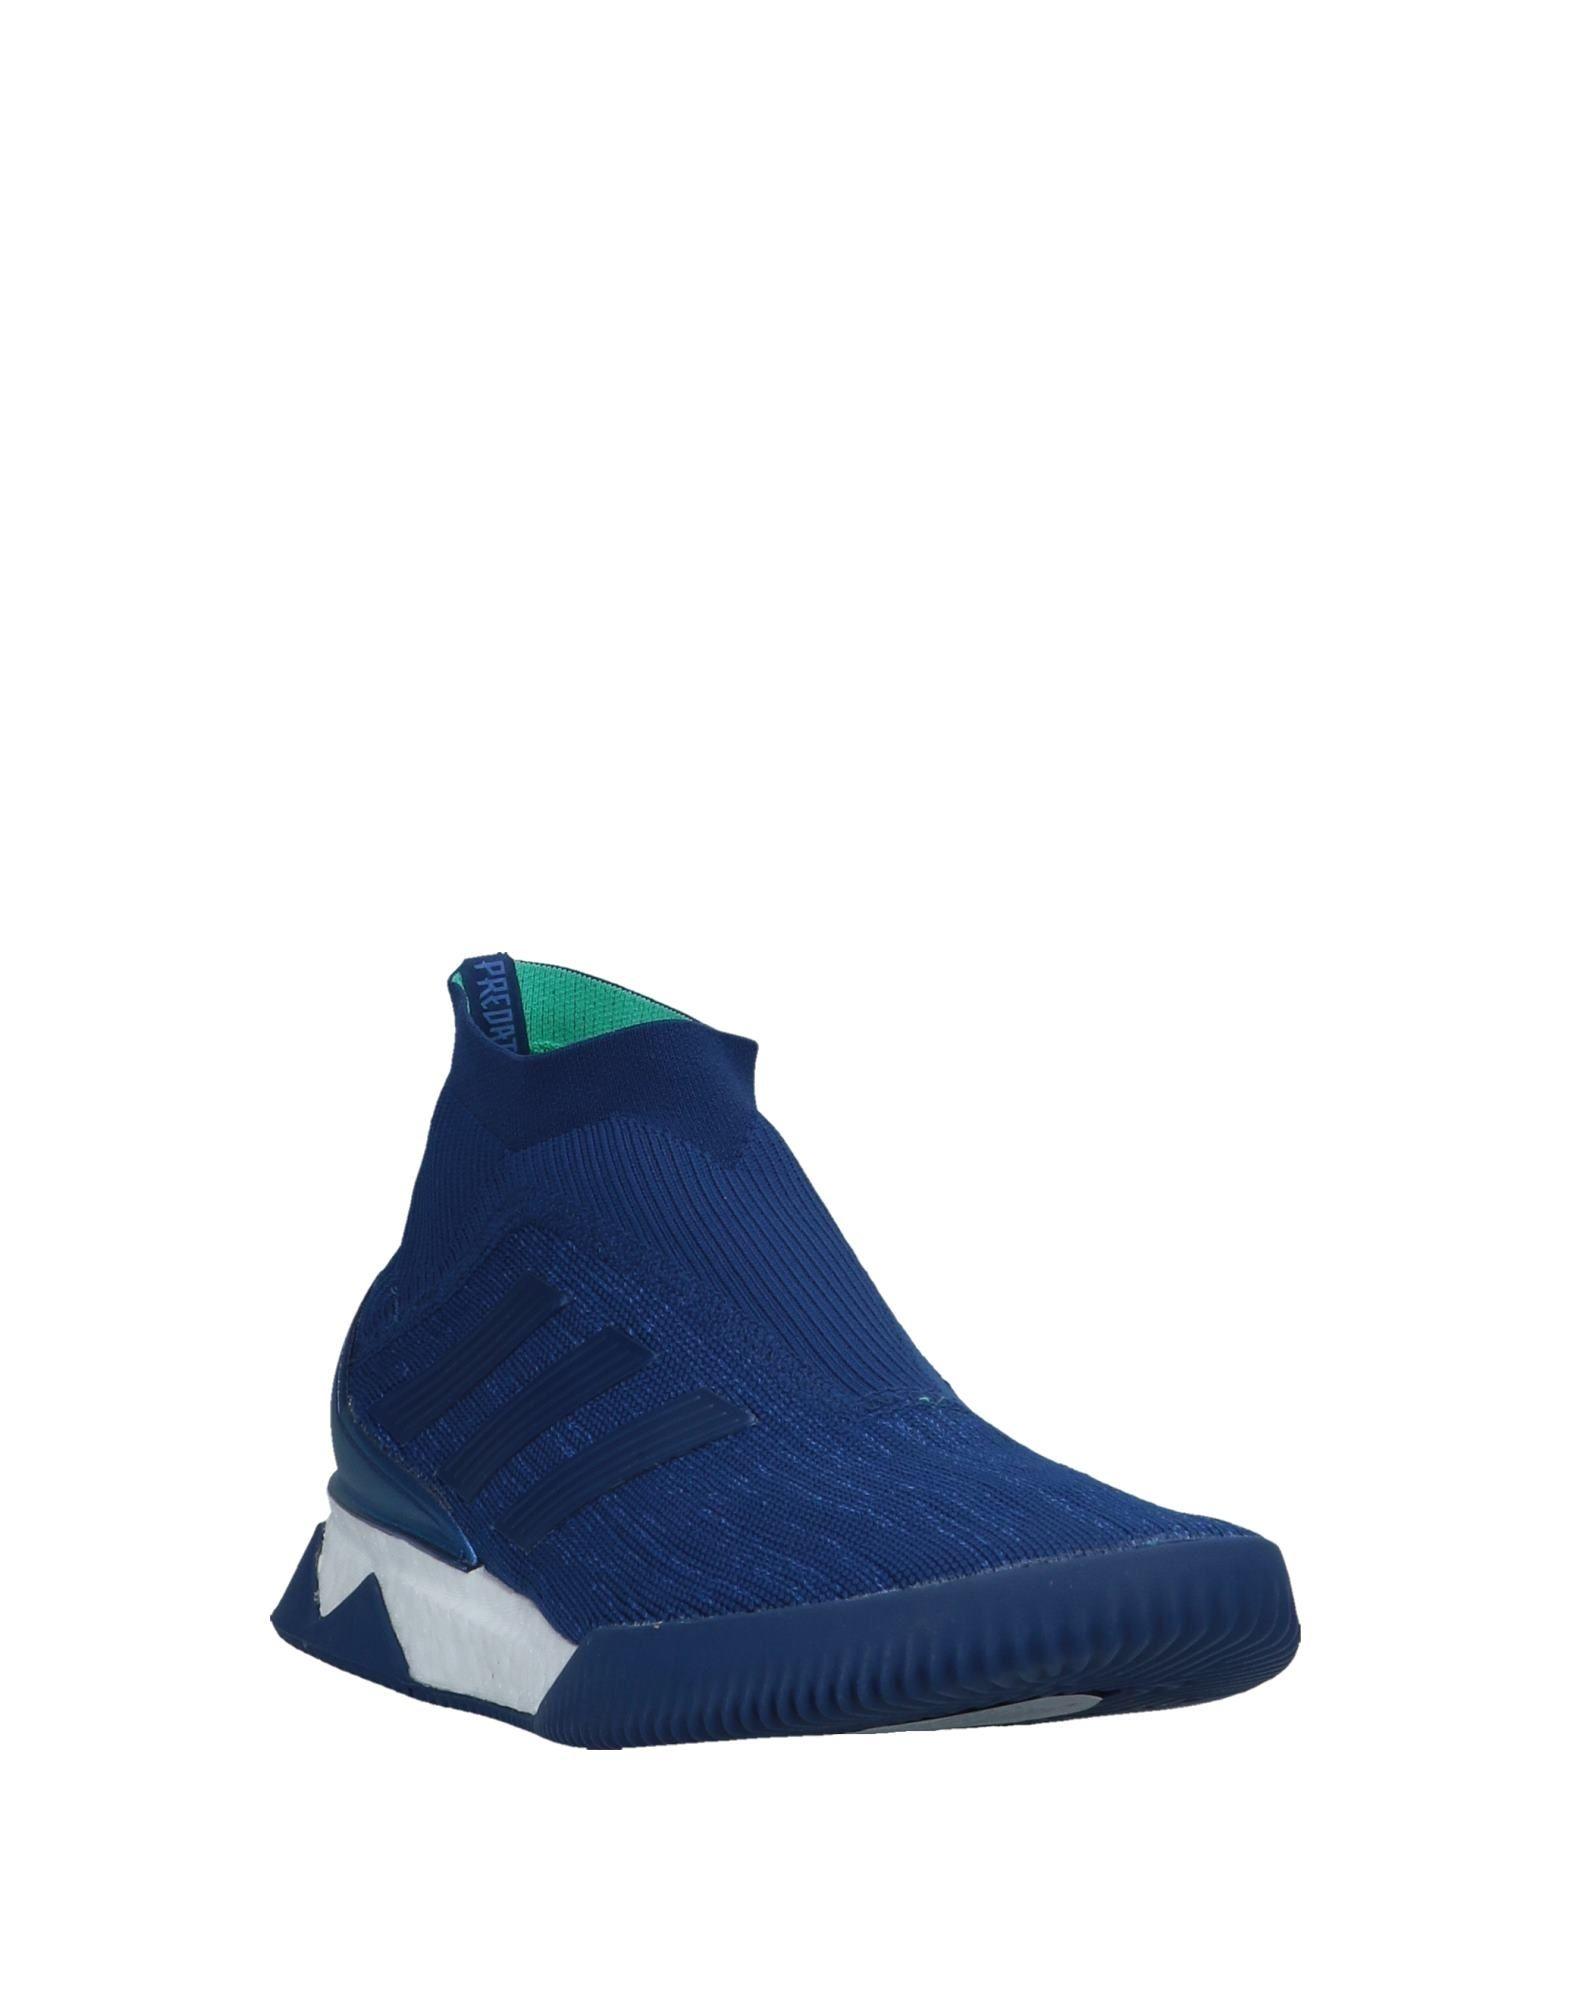 Adidas Sneakers Herren  11541855QR Gute Qualität beliebte Schuhe